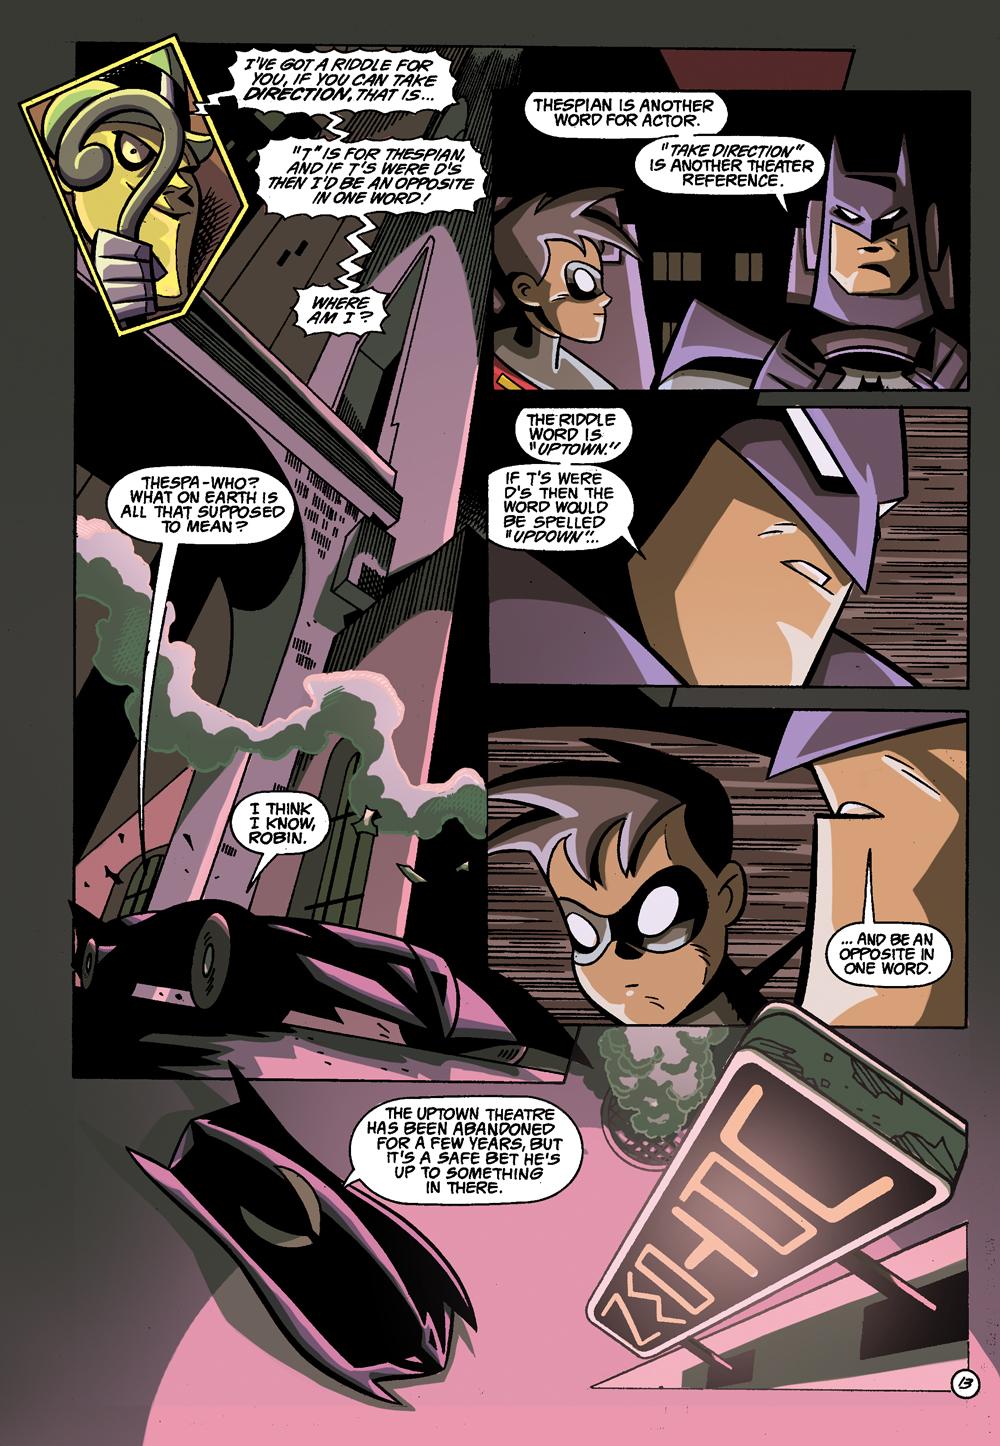 Batman: Gotham Adventures #1 Sample Page 1